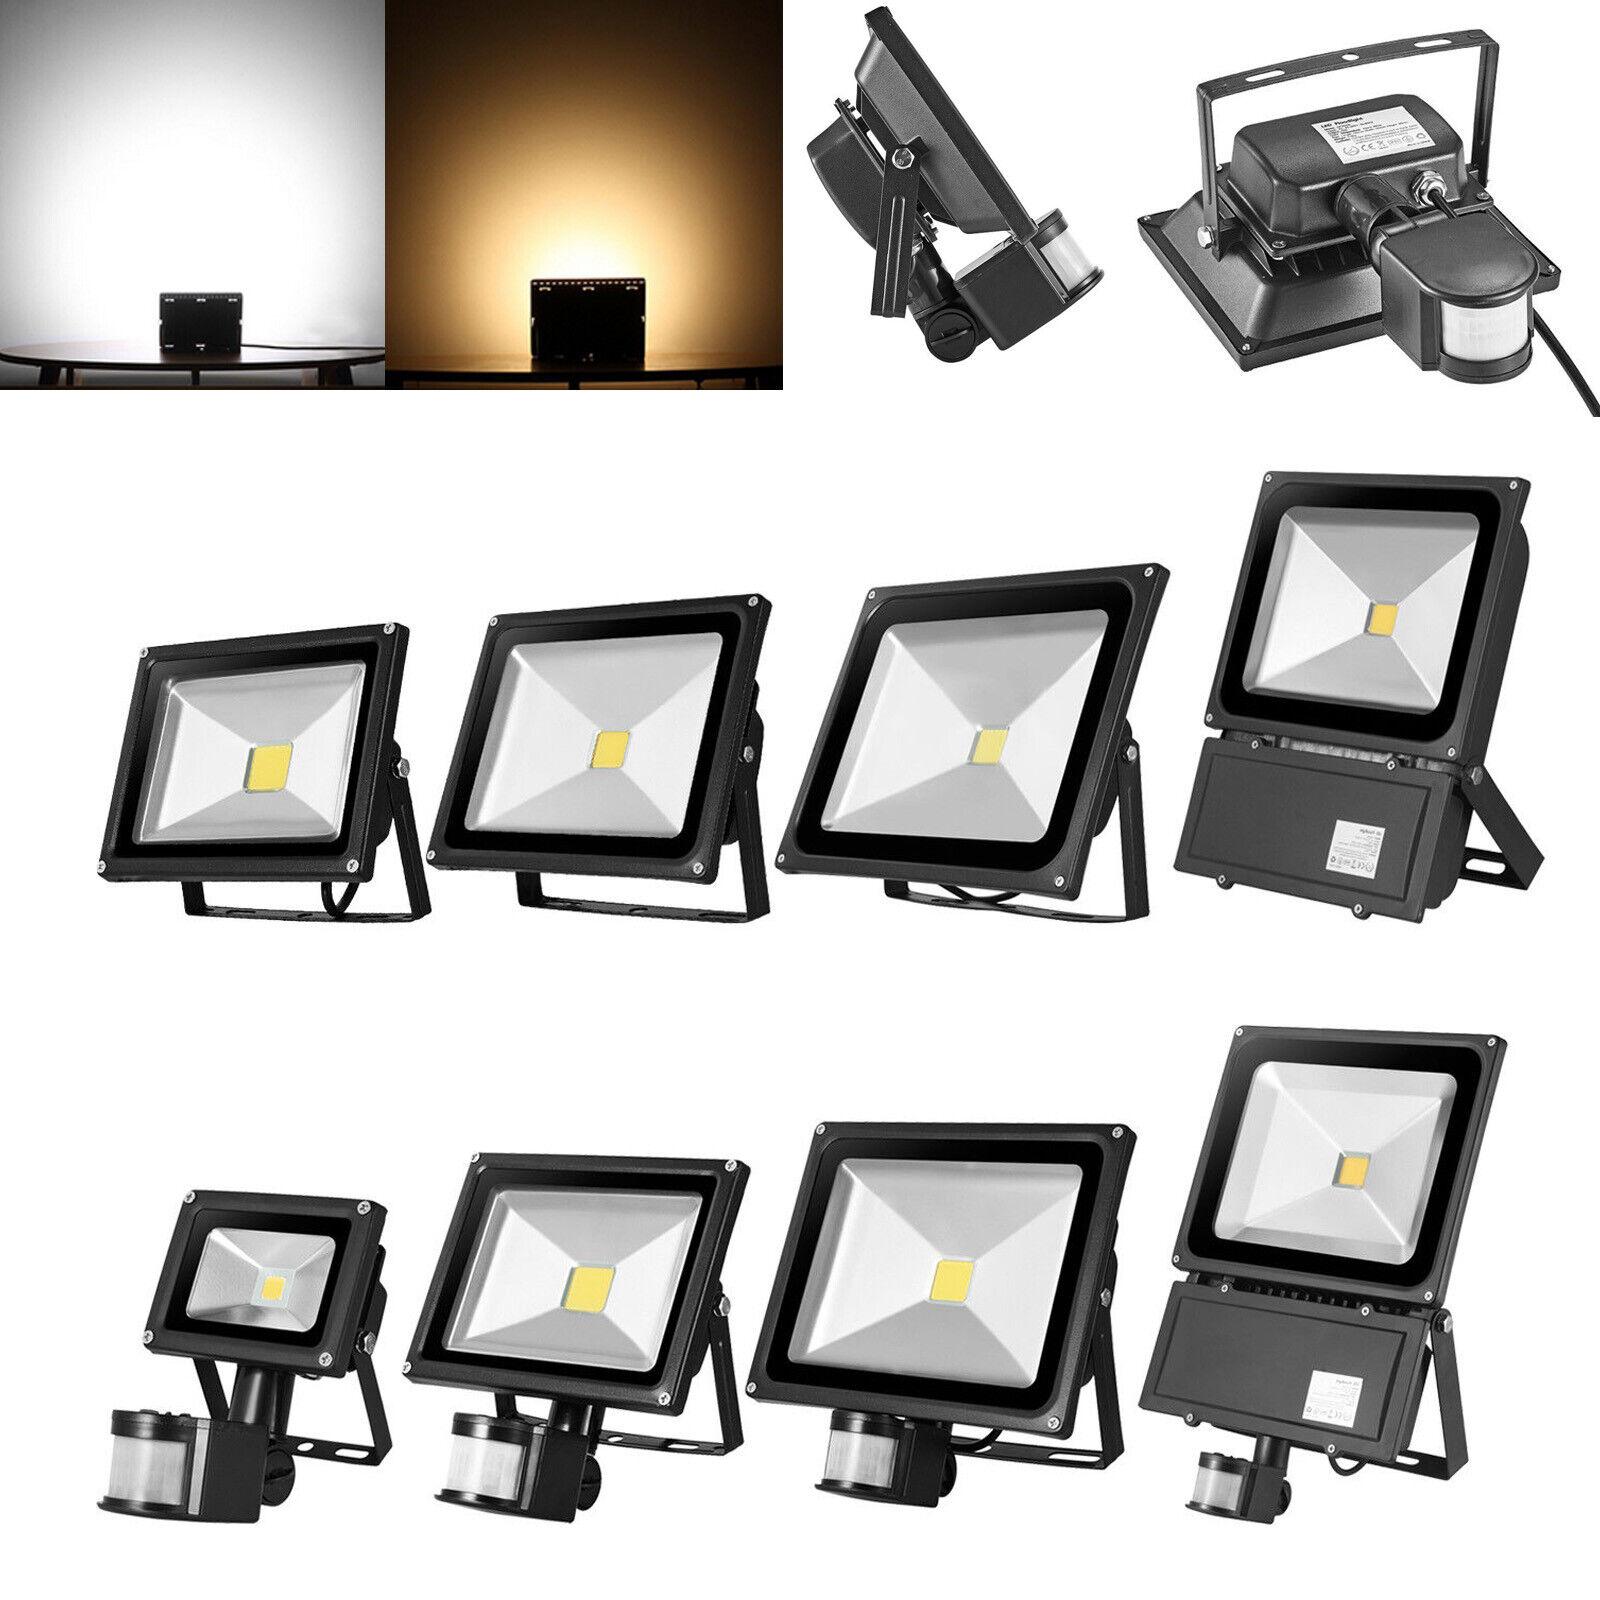 LED Flutlicht Fluter Strahler COB Außen Scheinwerfer 10W 20W 30W 50W 100W 300W